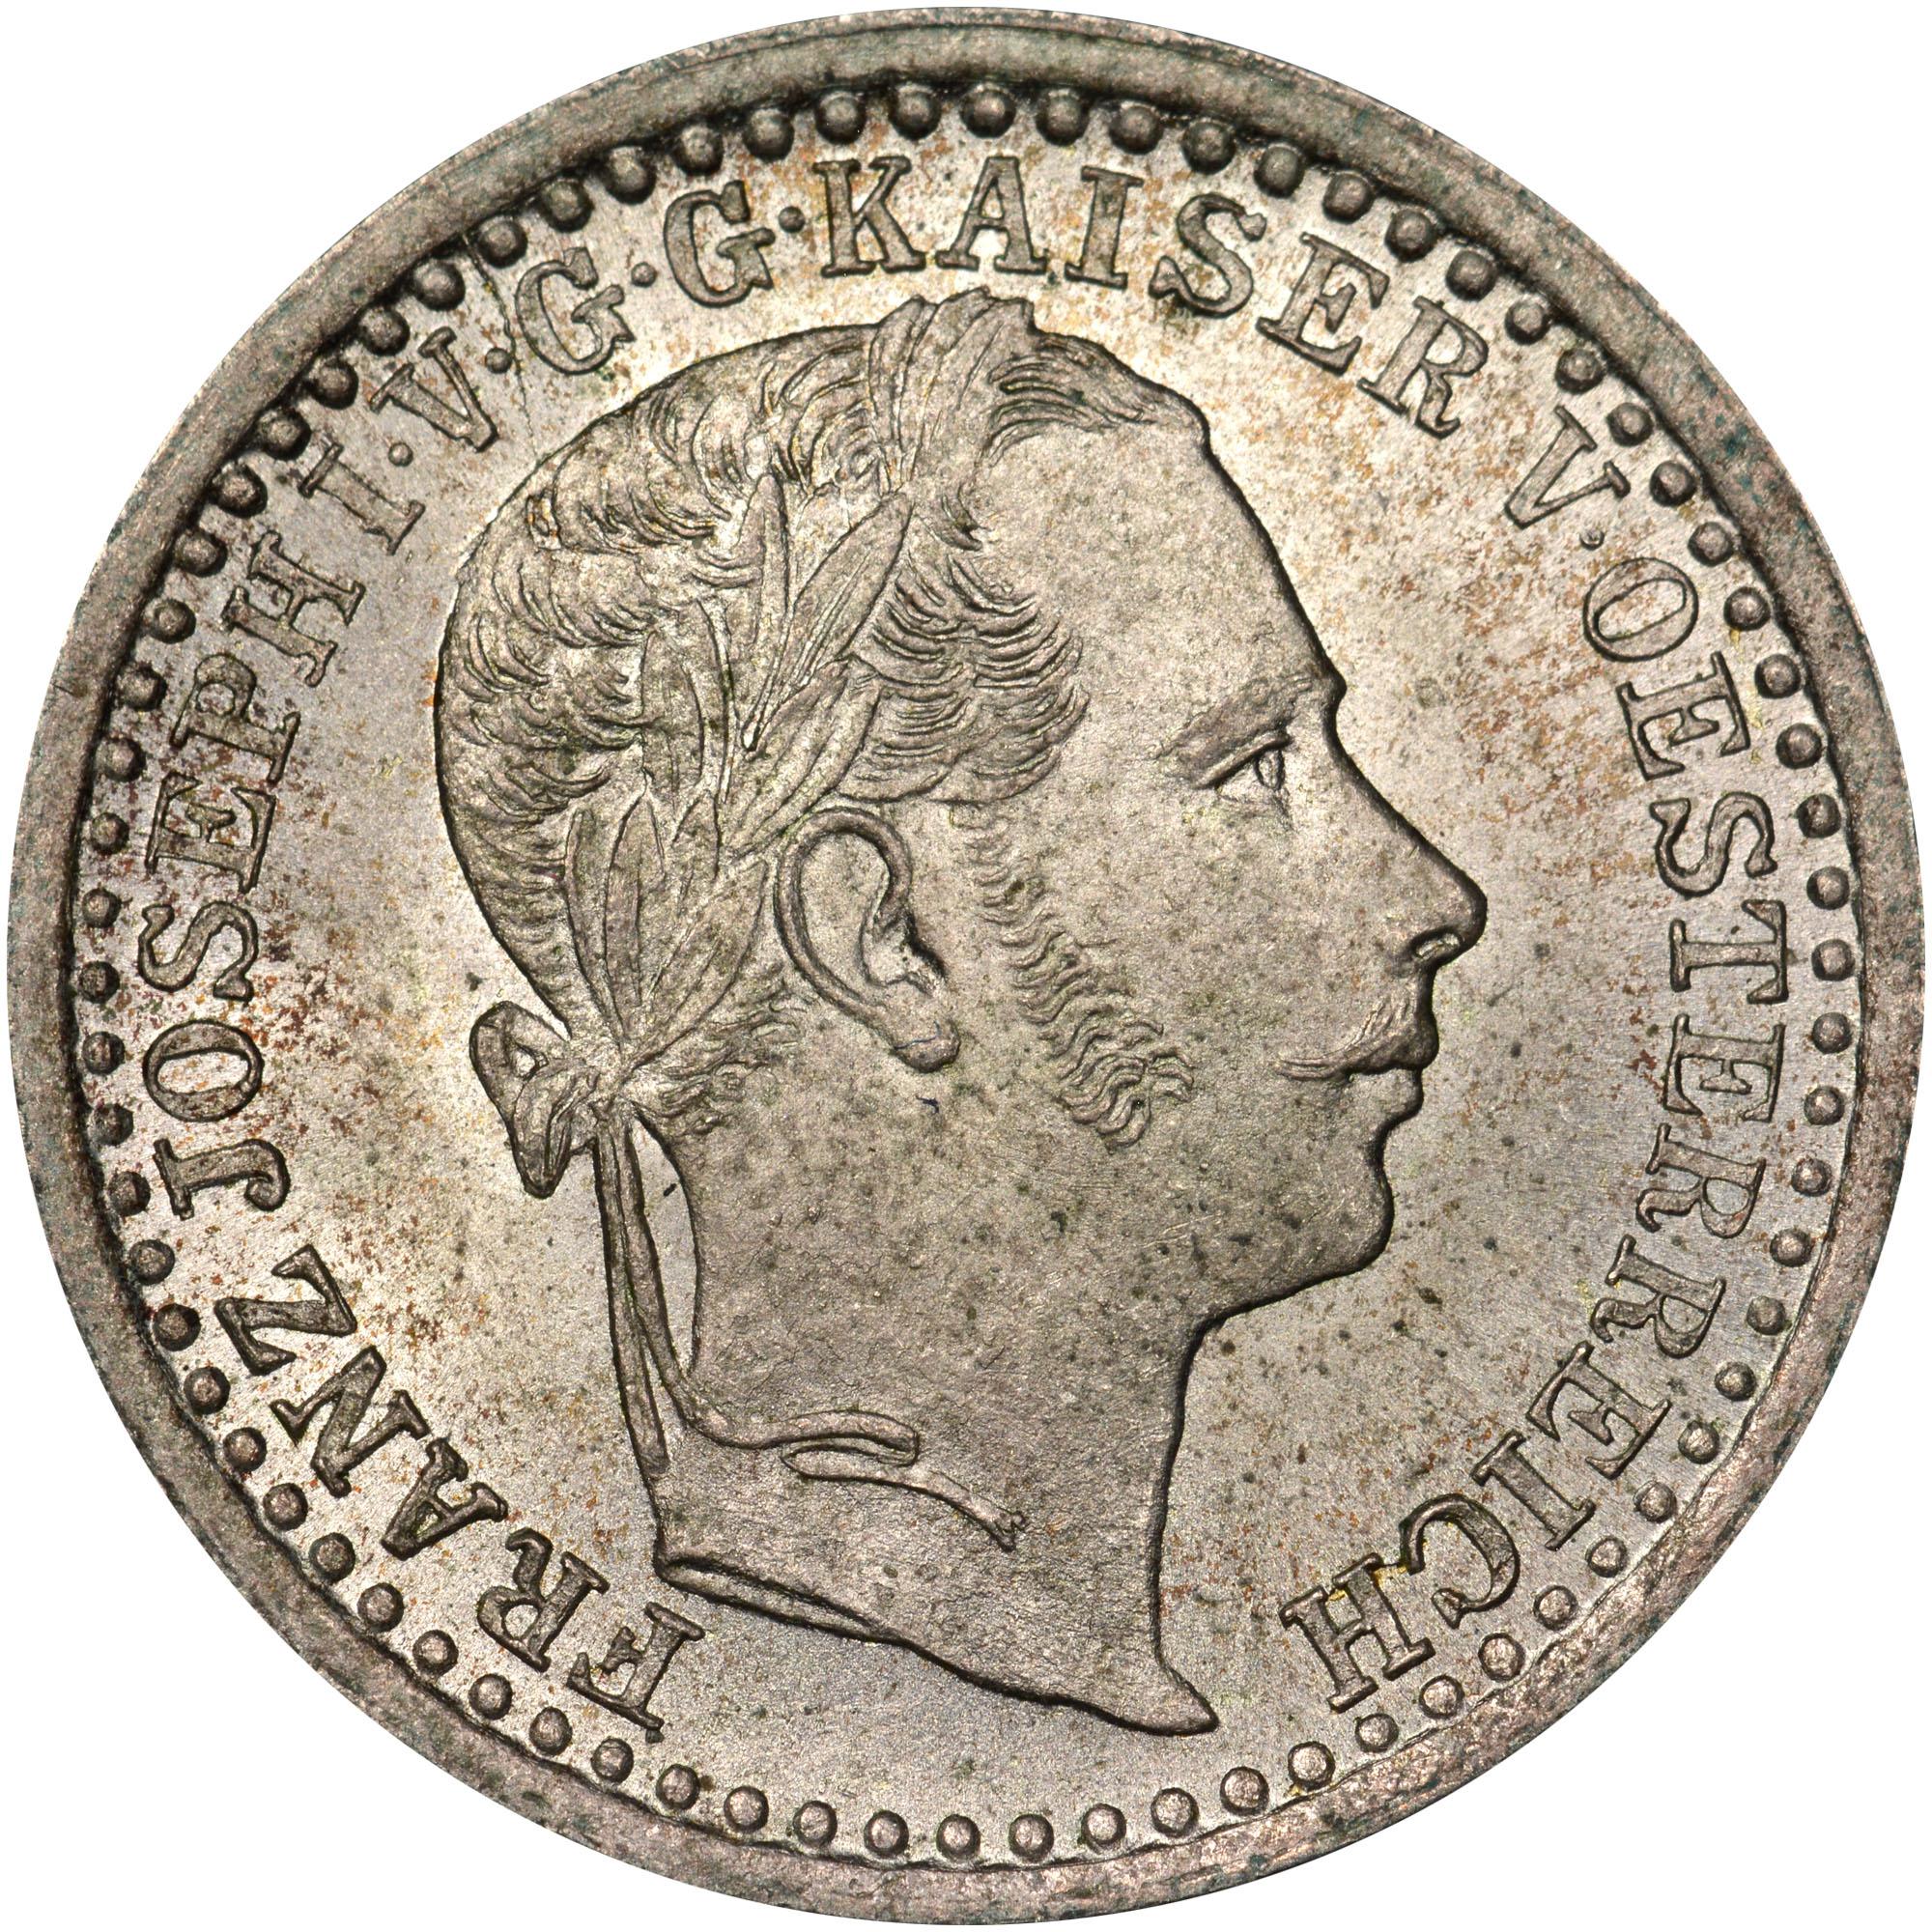 1858-1864 Austria 5 Kreuzer obverse